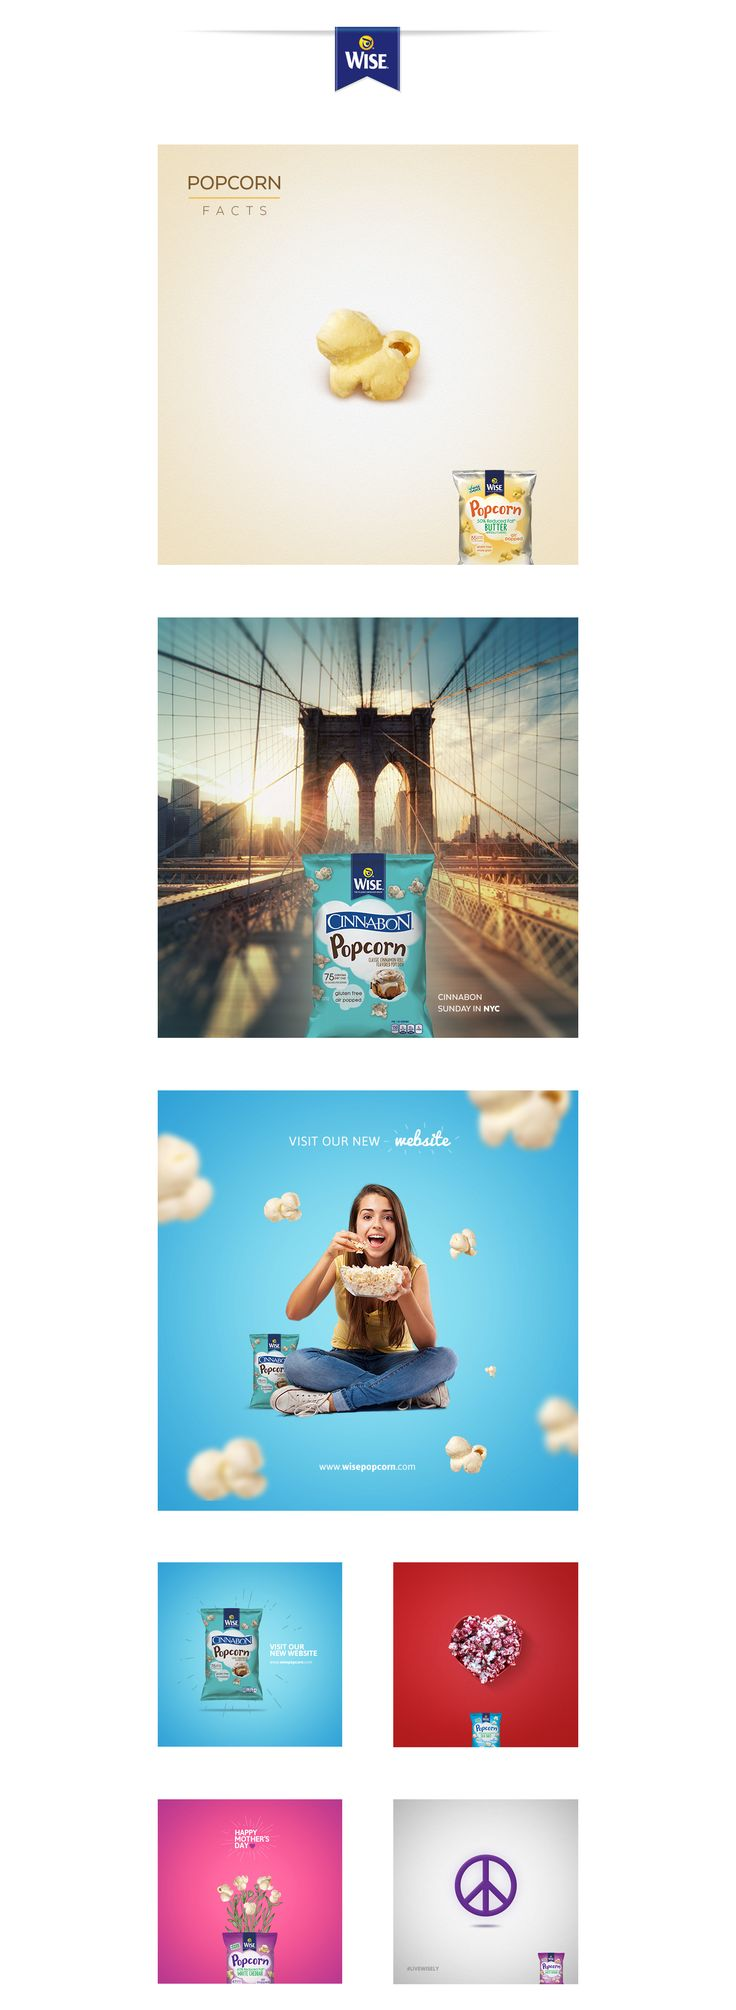 Wise Popcorn | Social Media on Behance